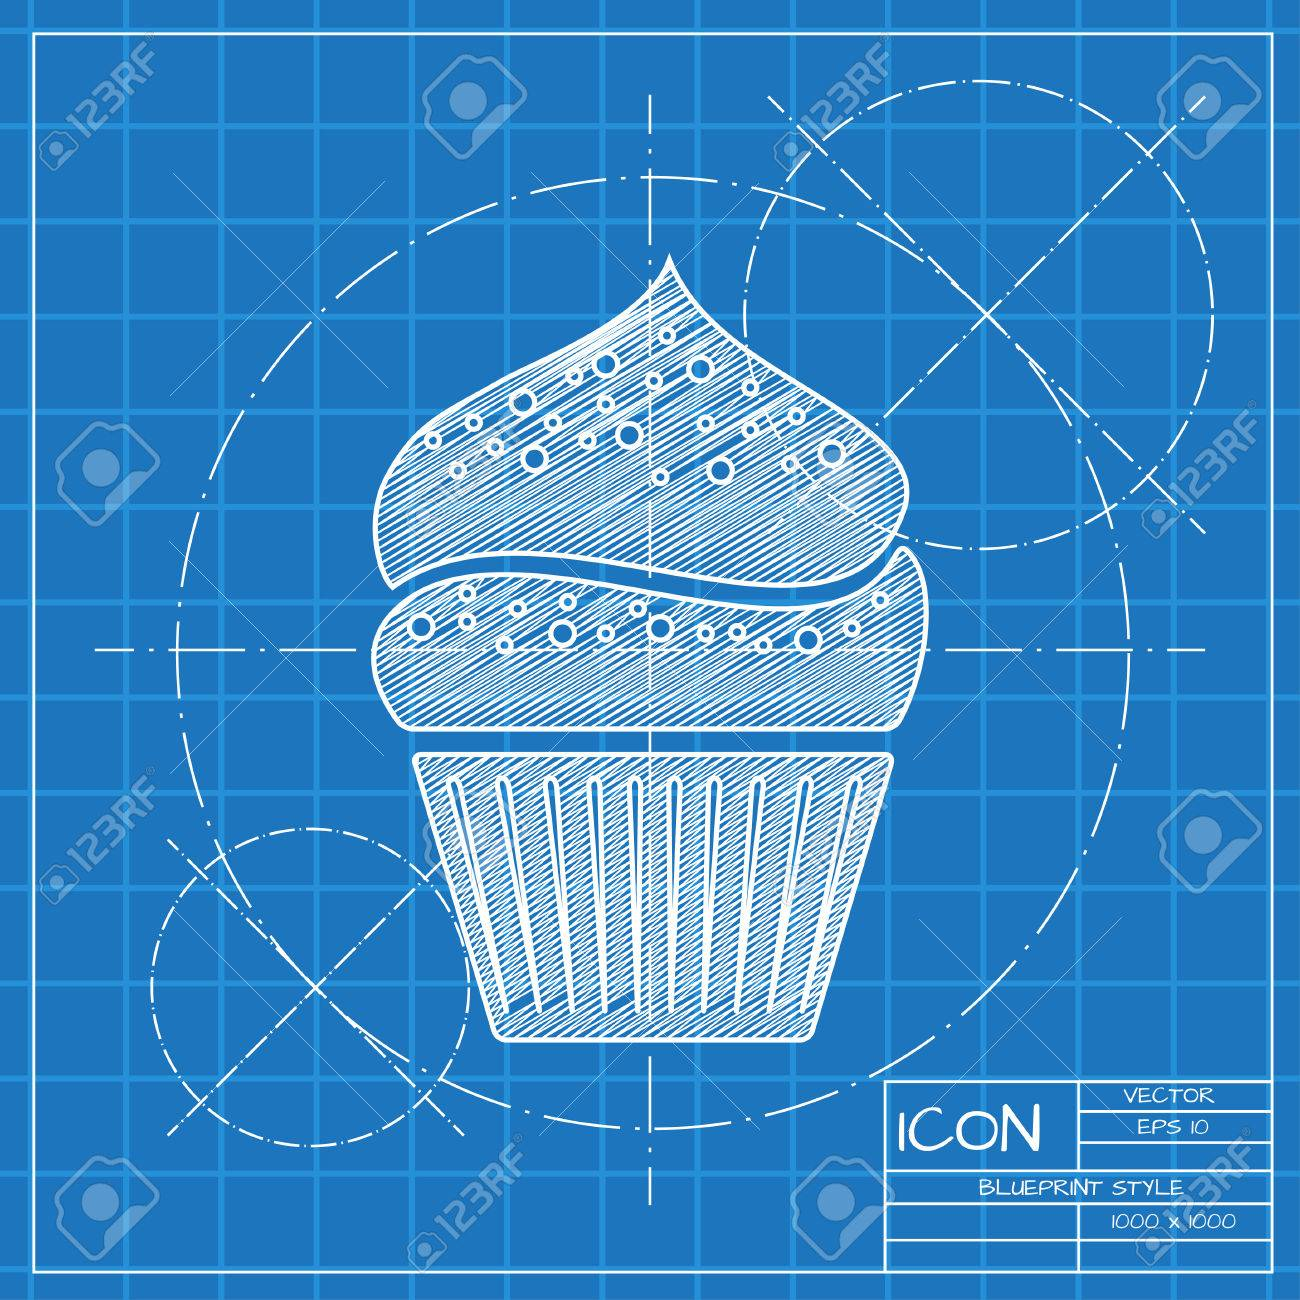 Beste blaupausen tutorial lesen ideen schaltplan serie circuit vector blueprint cupcake icon engineer and architect background malvernweather Image collections